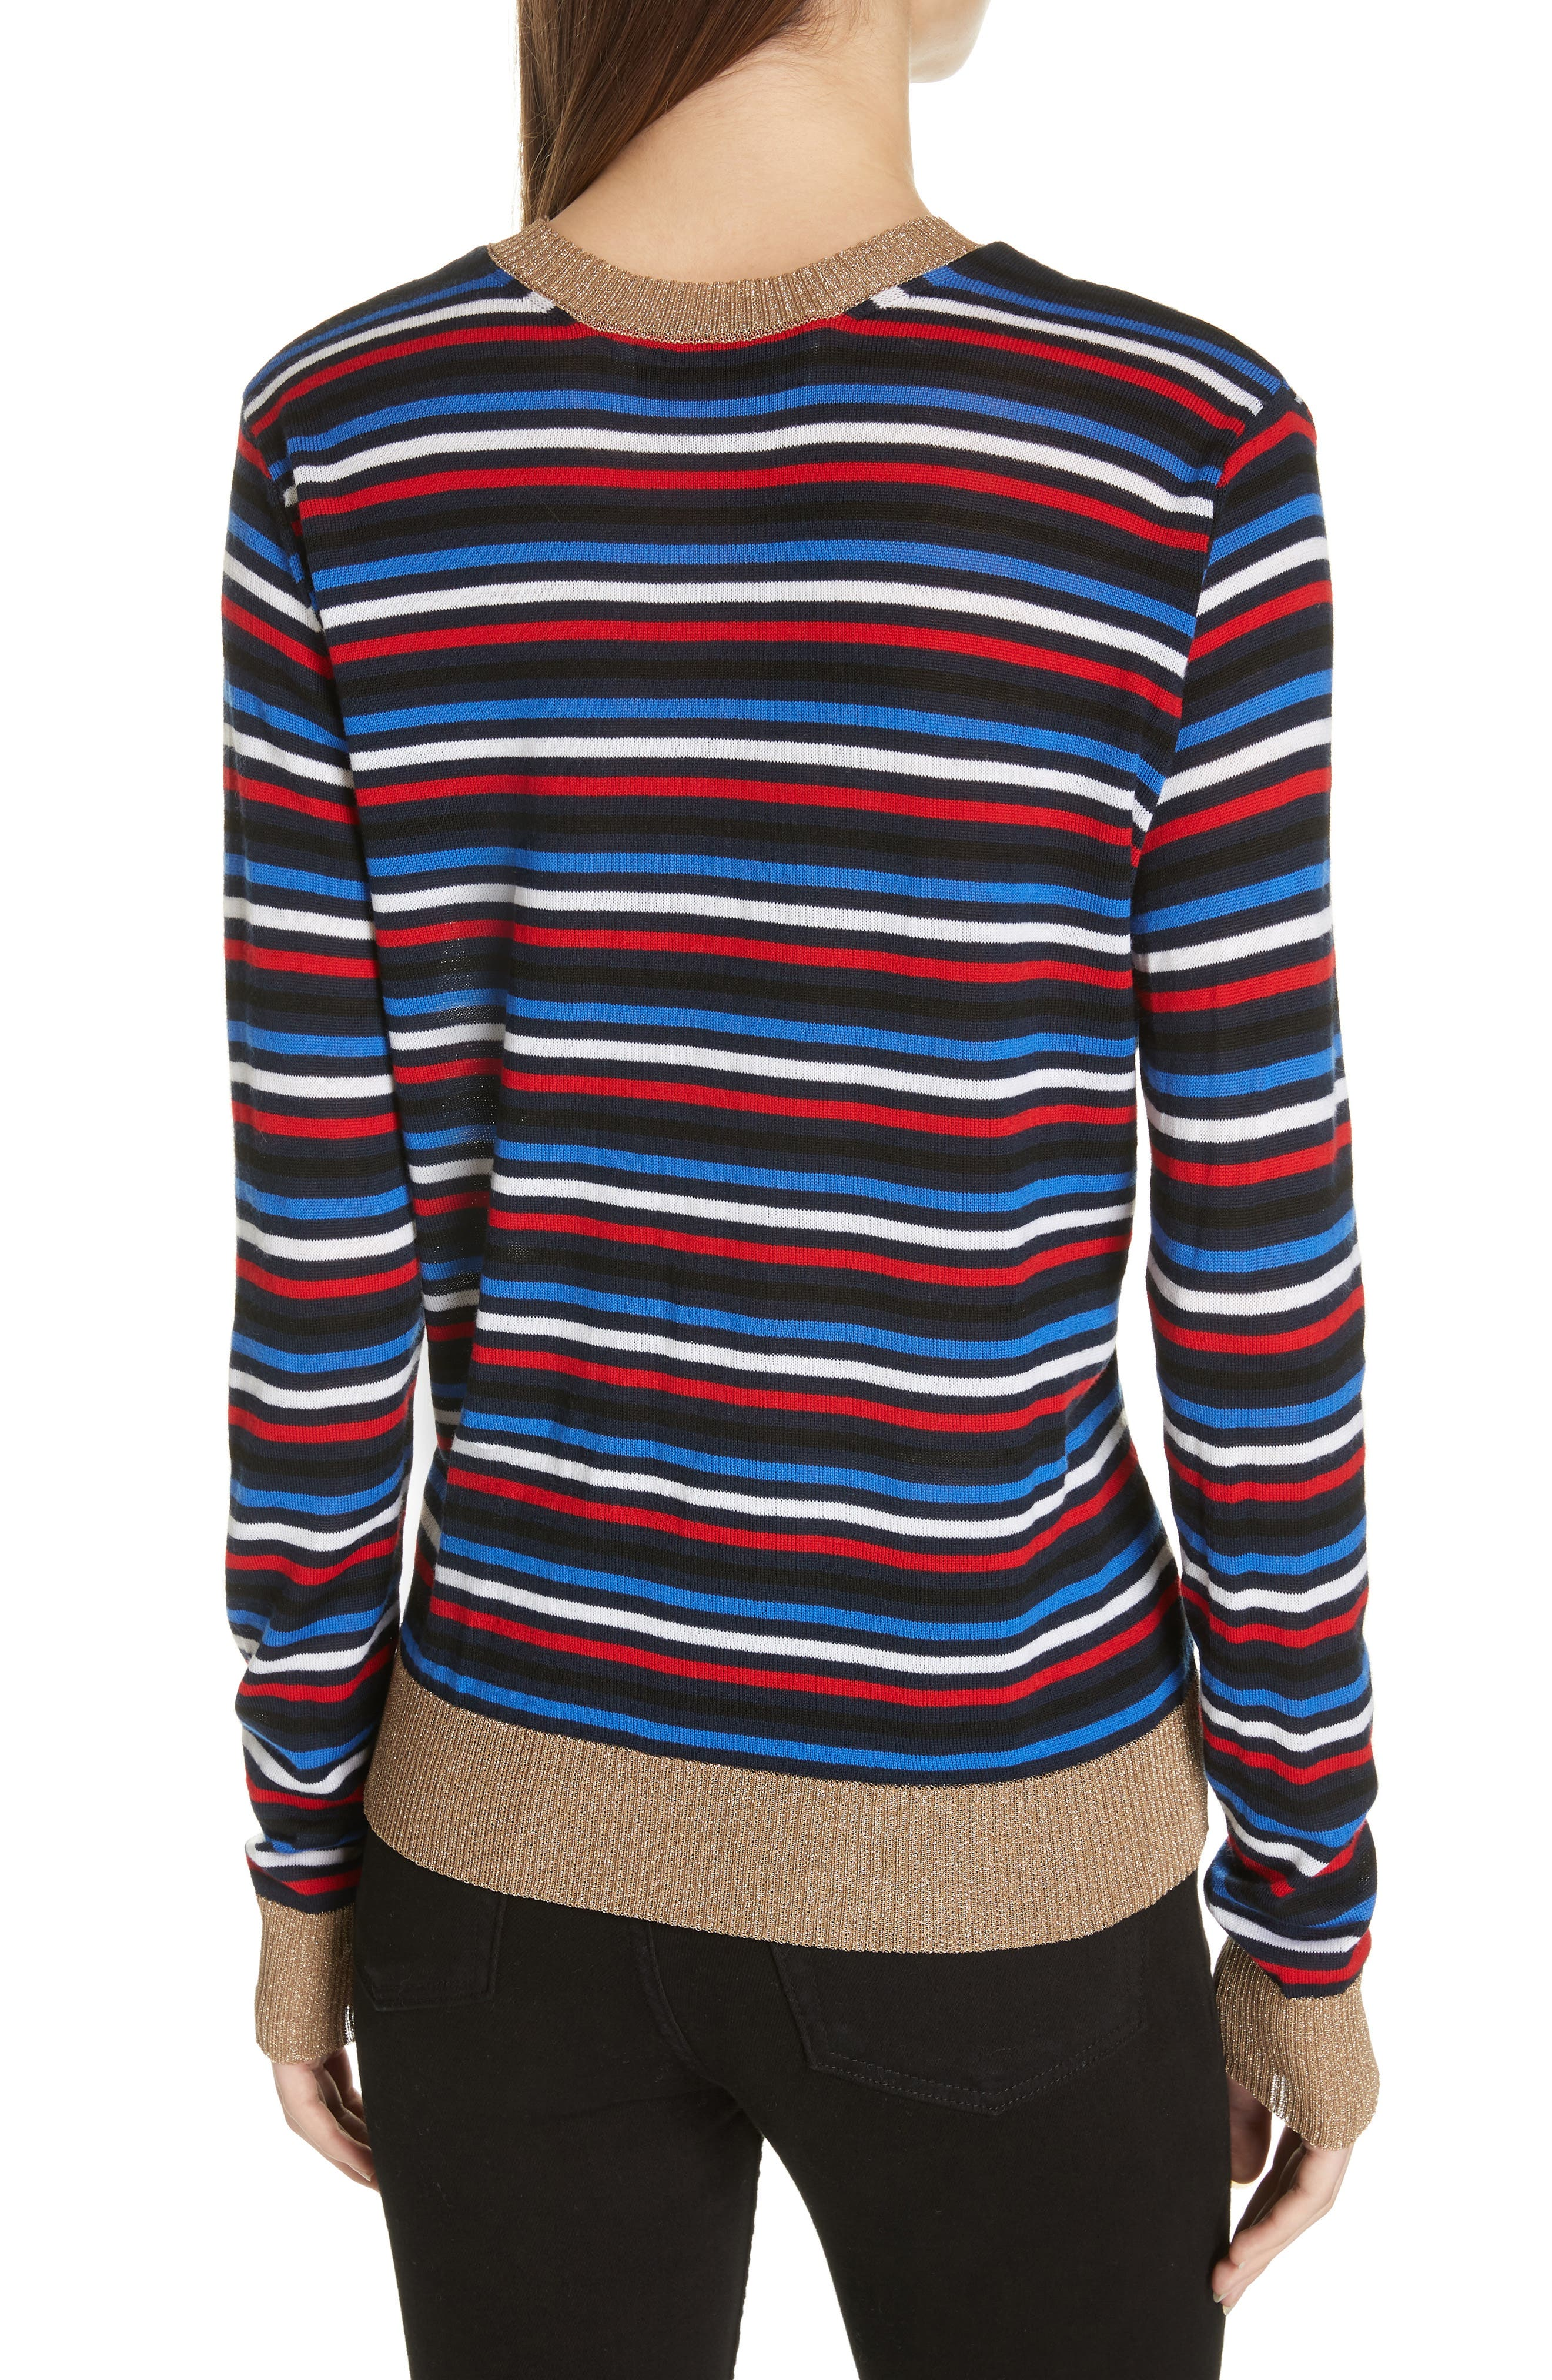 Stripe Knit Boyfriend Sweater,                             Alternate thumbnail 2, color,                             NAVY MULTI STRIPE